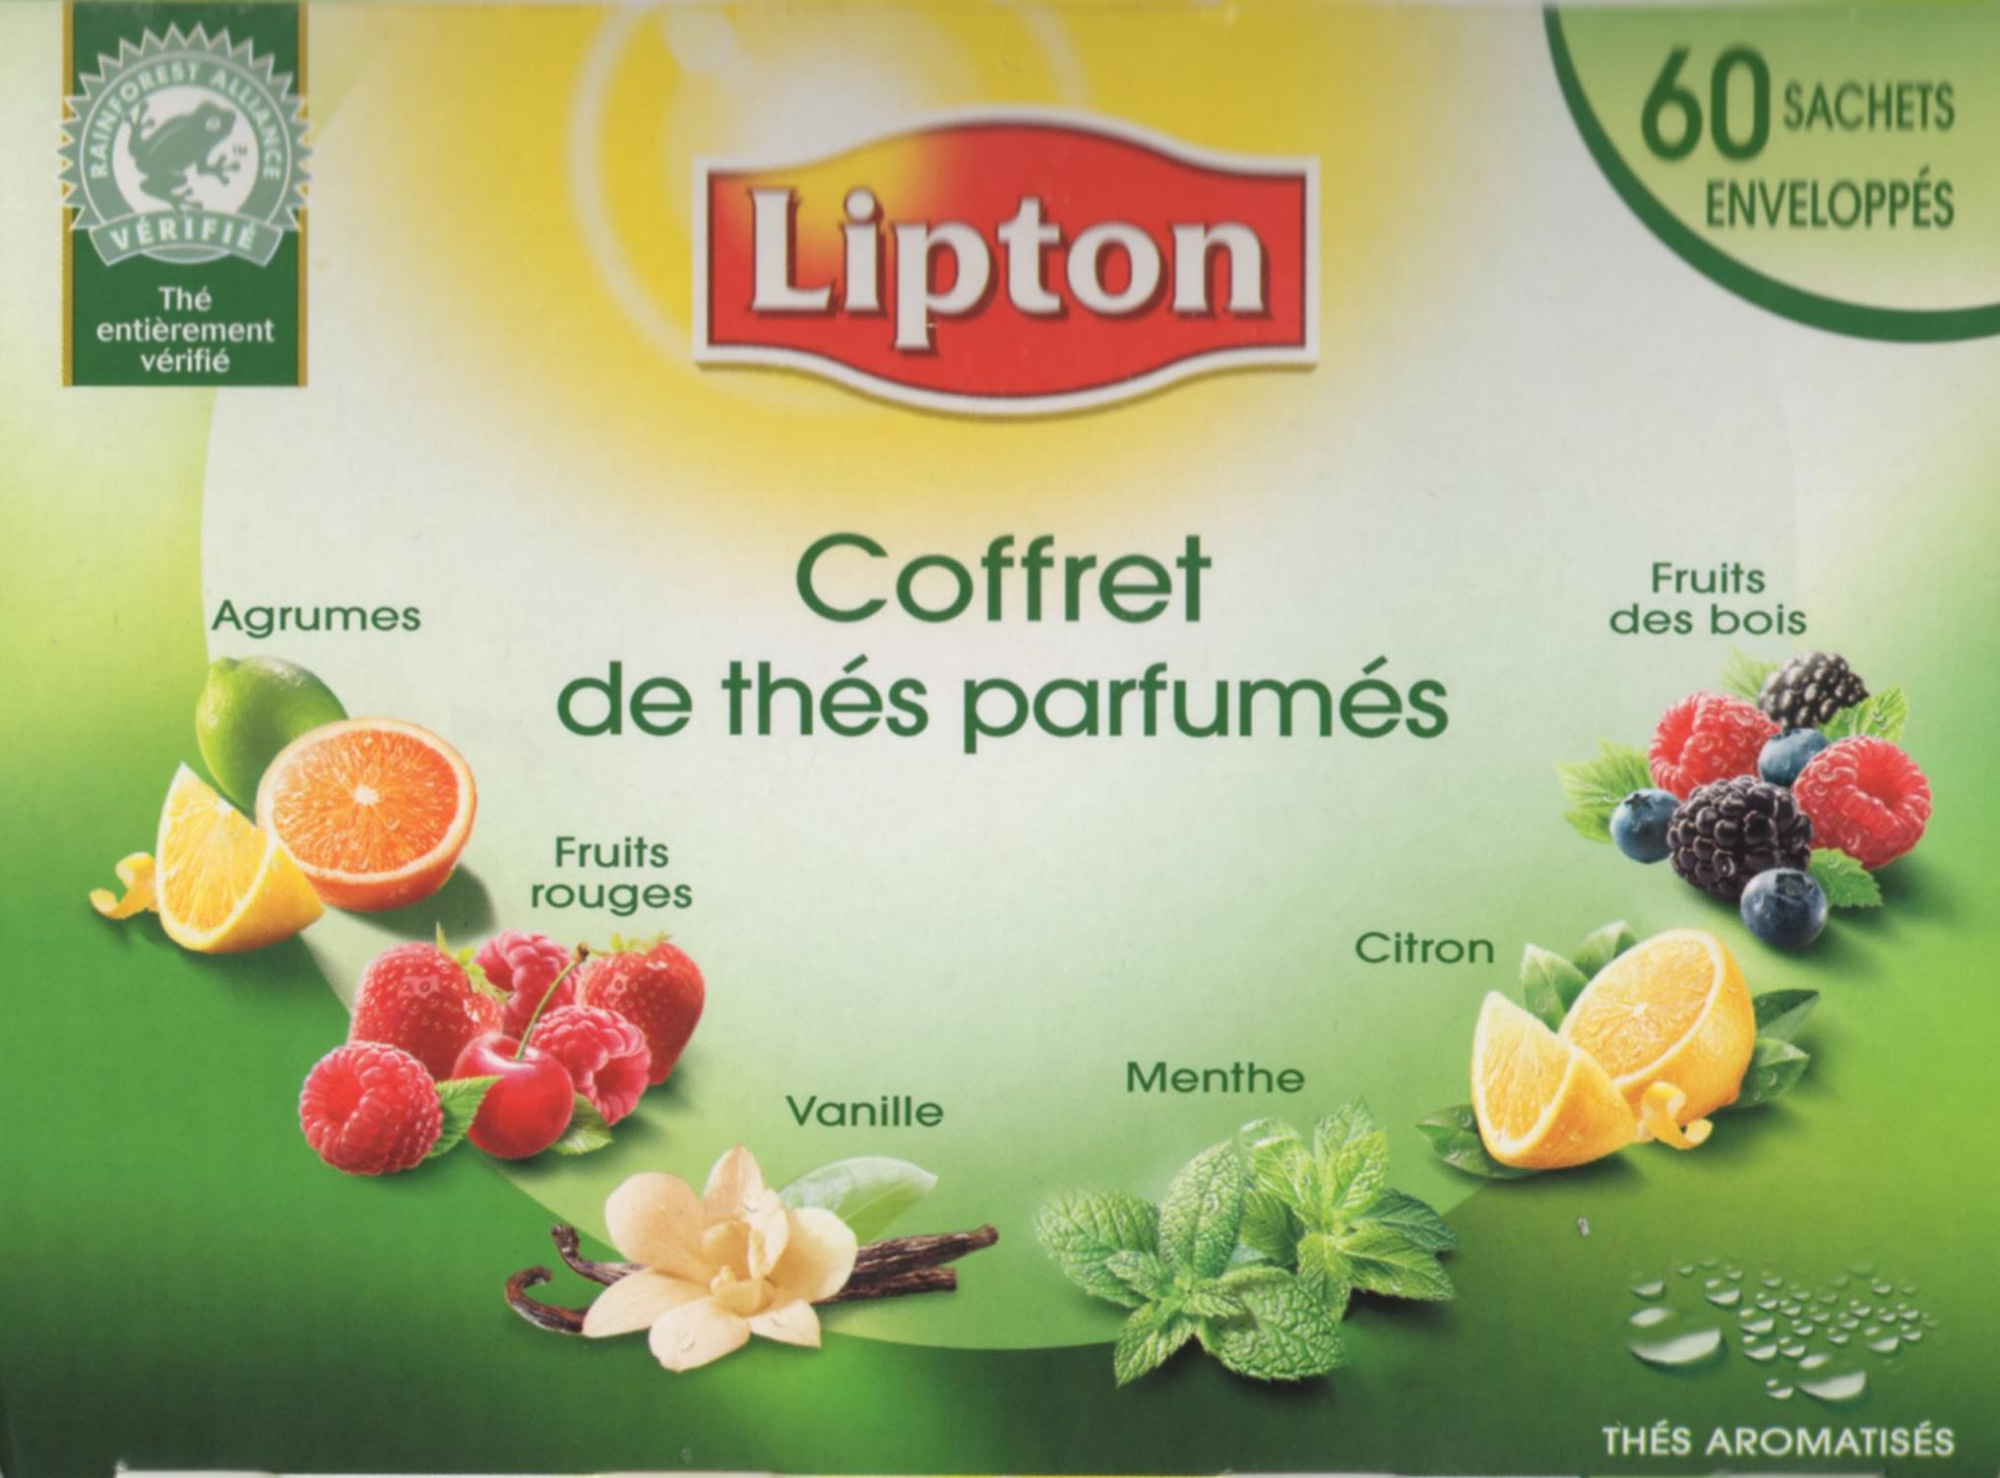 Coffret de Thés parfumés - Product